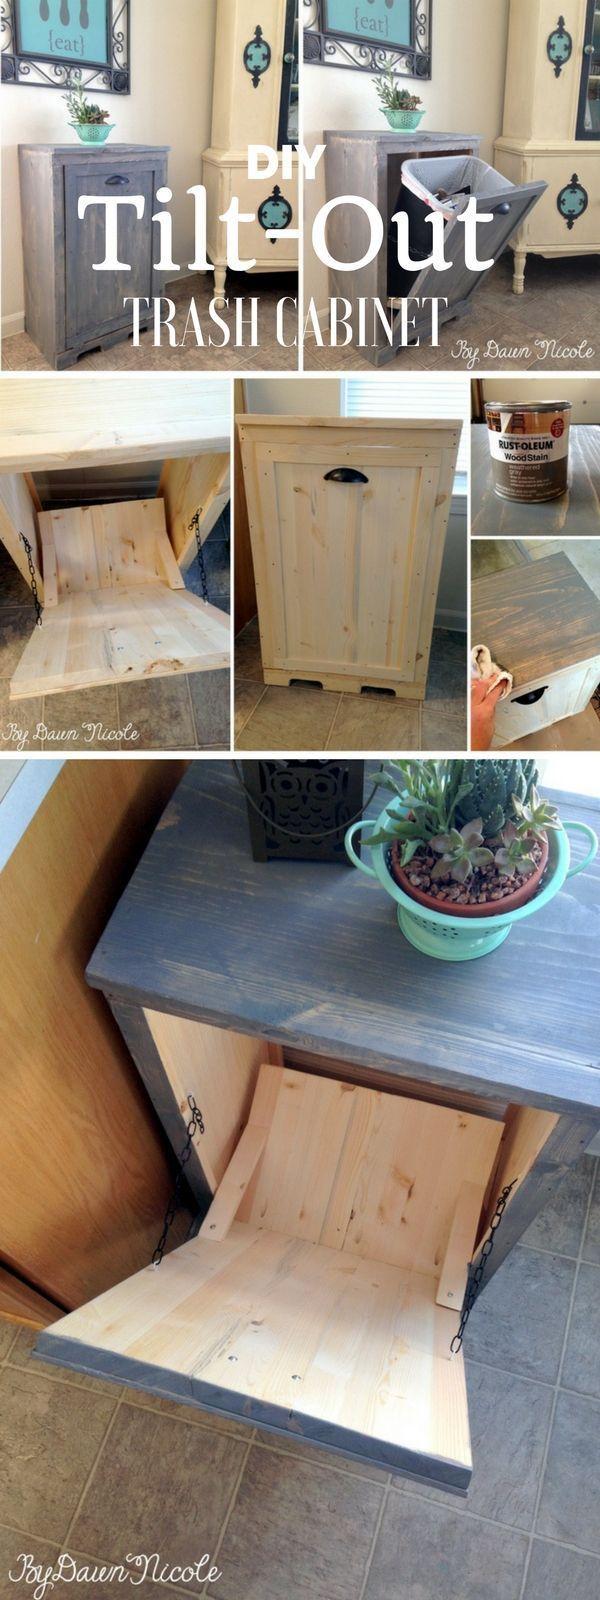 DIY Furniture Plans & Tutorials : 15 Glorious Diy Tricks Home